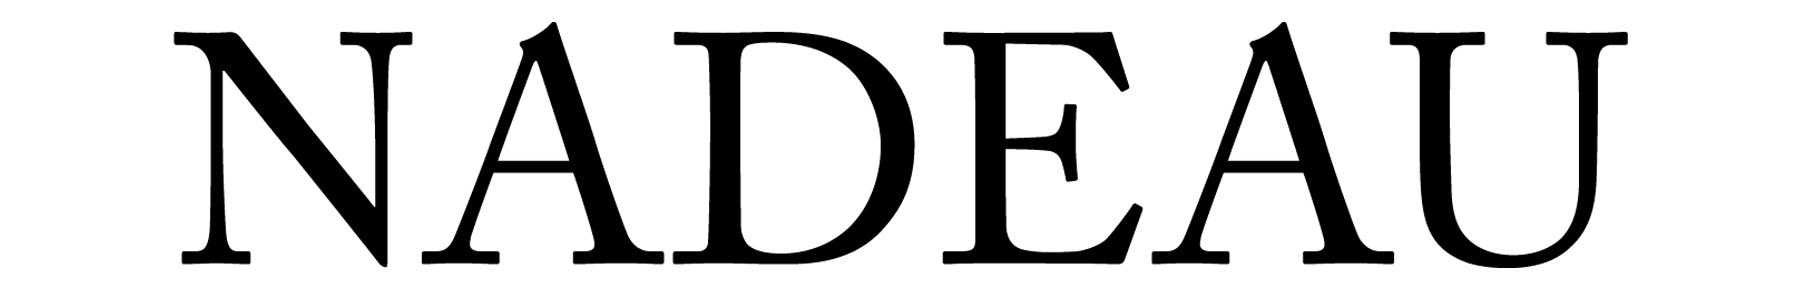 NADEAU logo.jpg